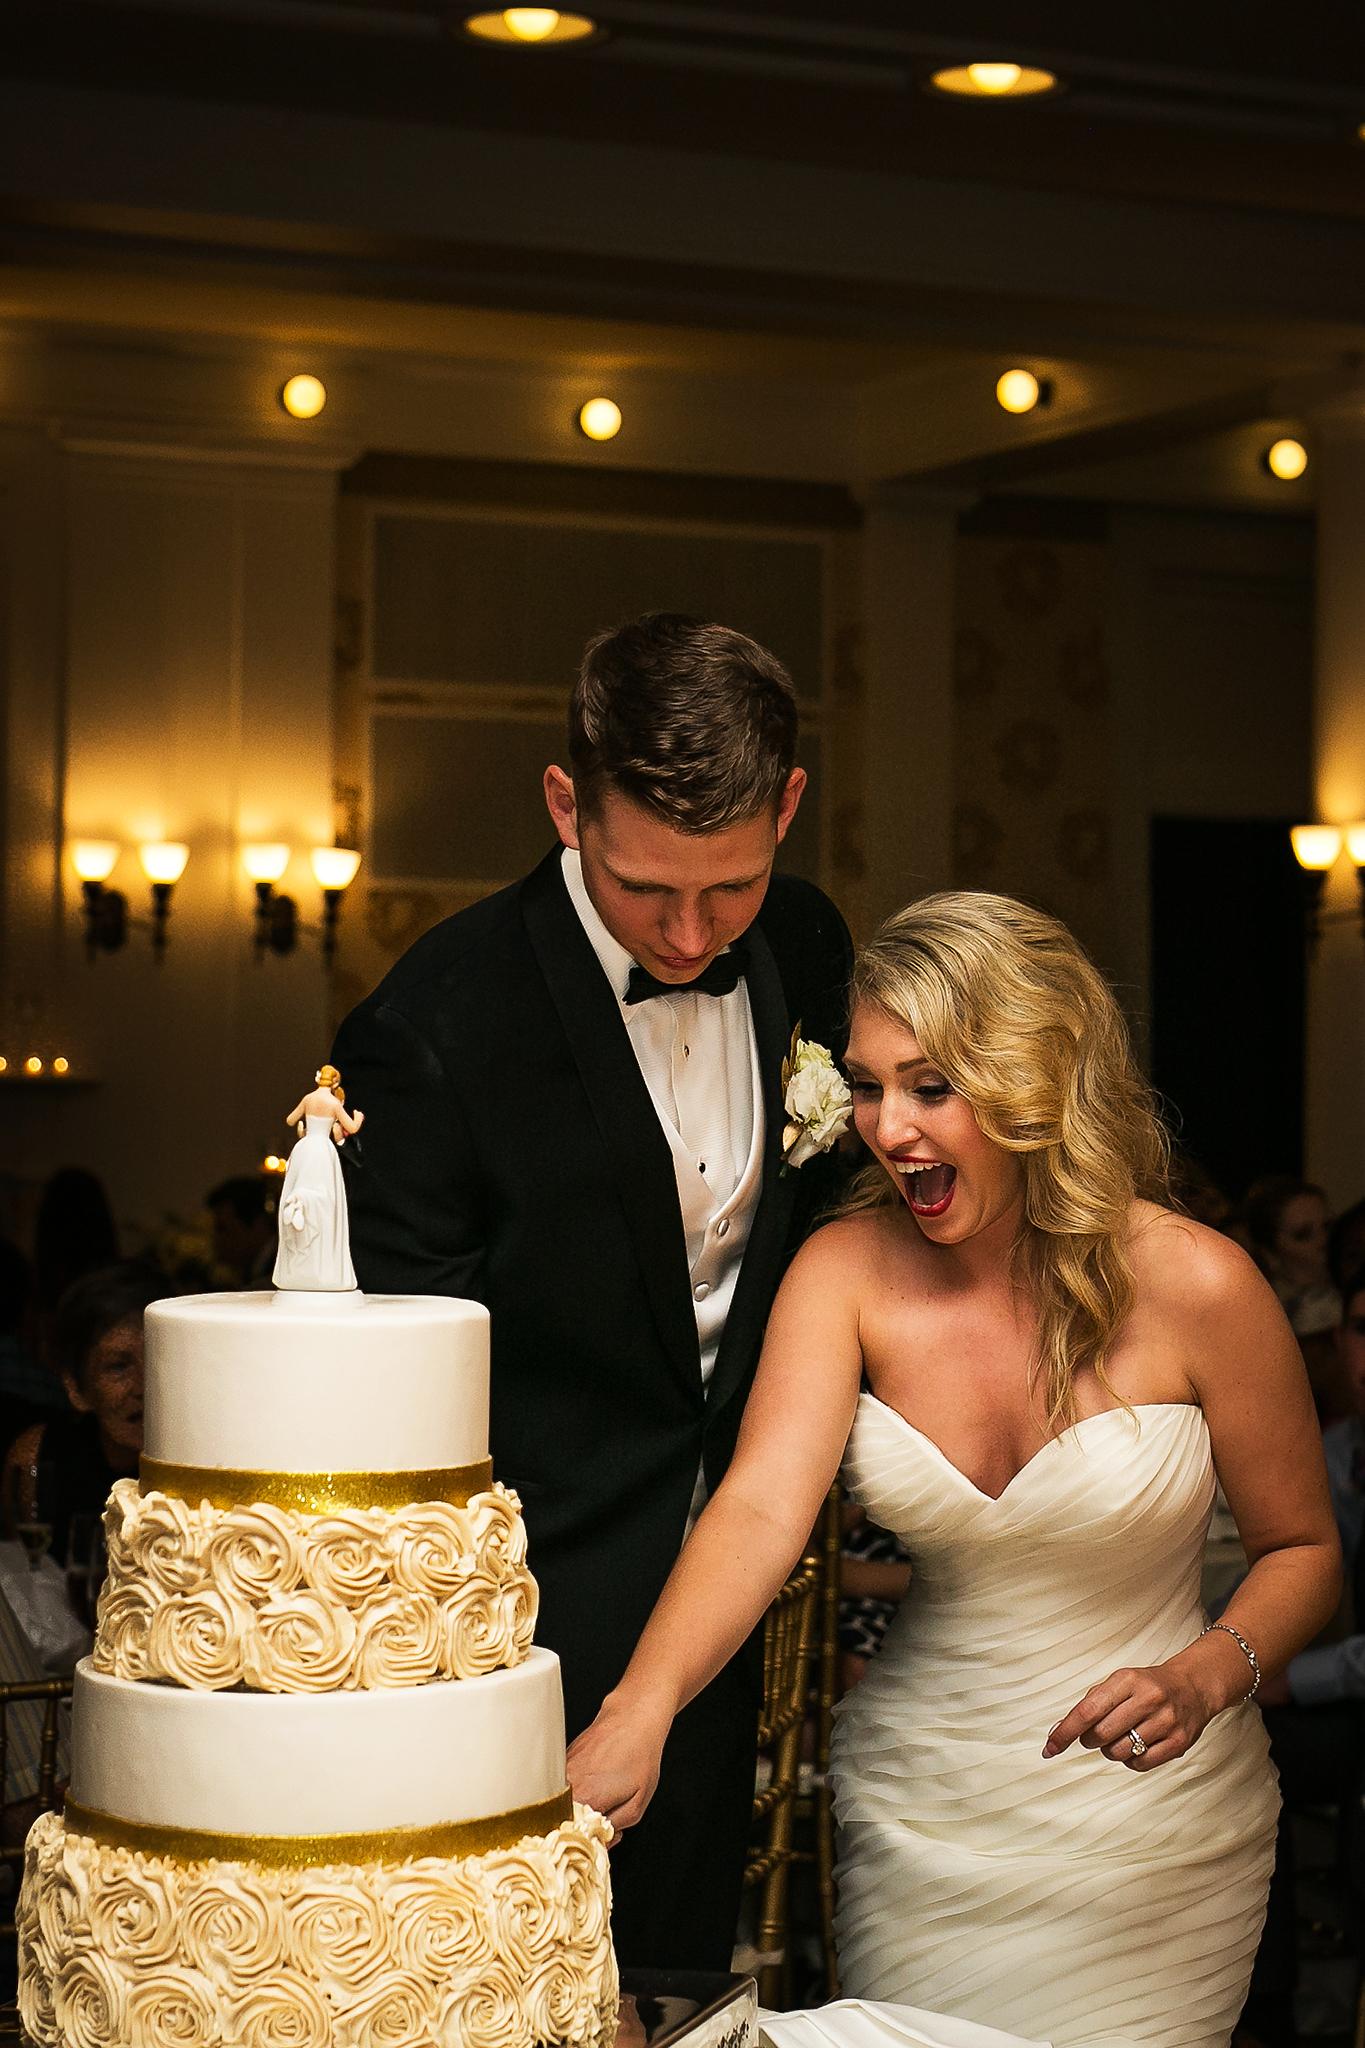 omni bedford springs cake cutting